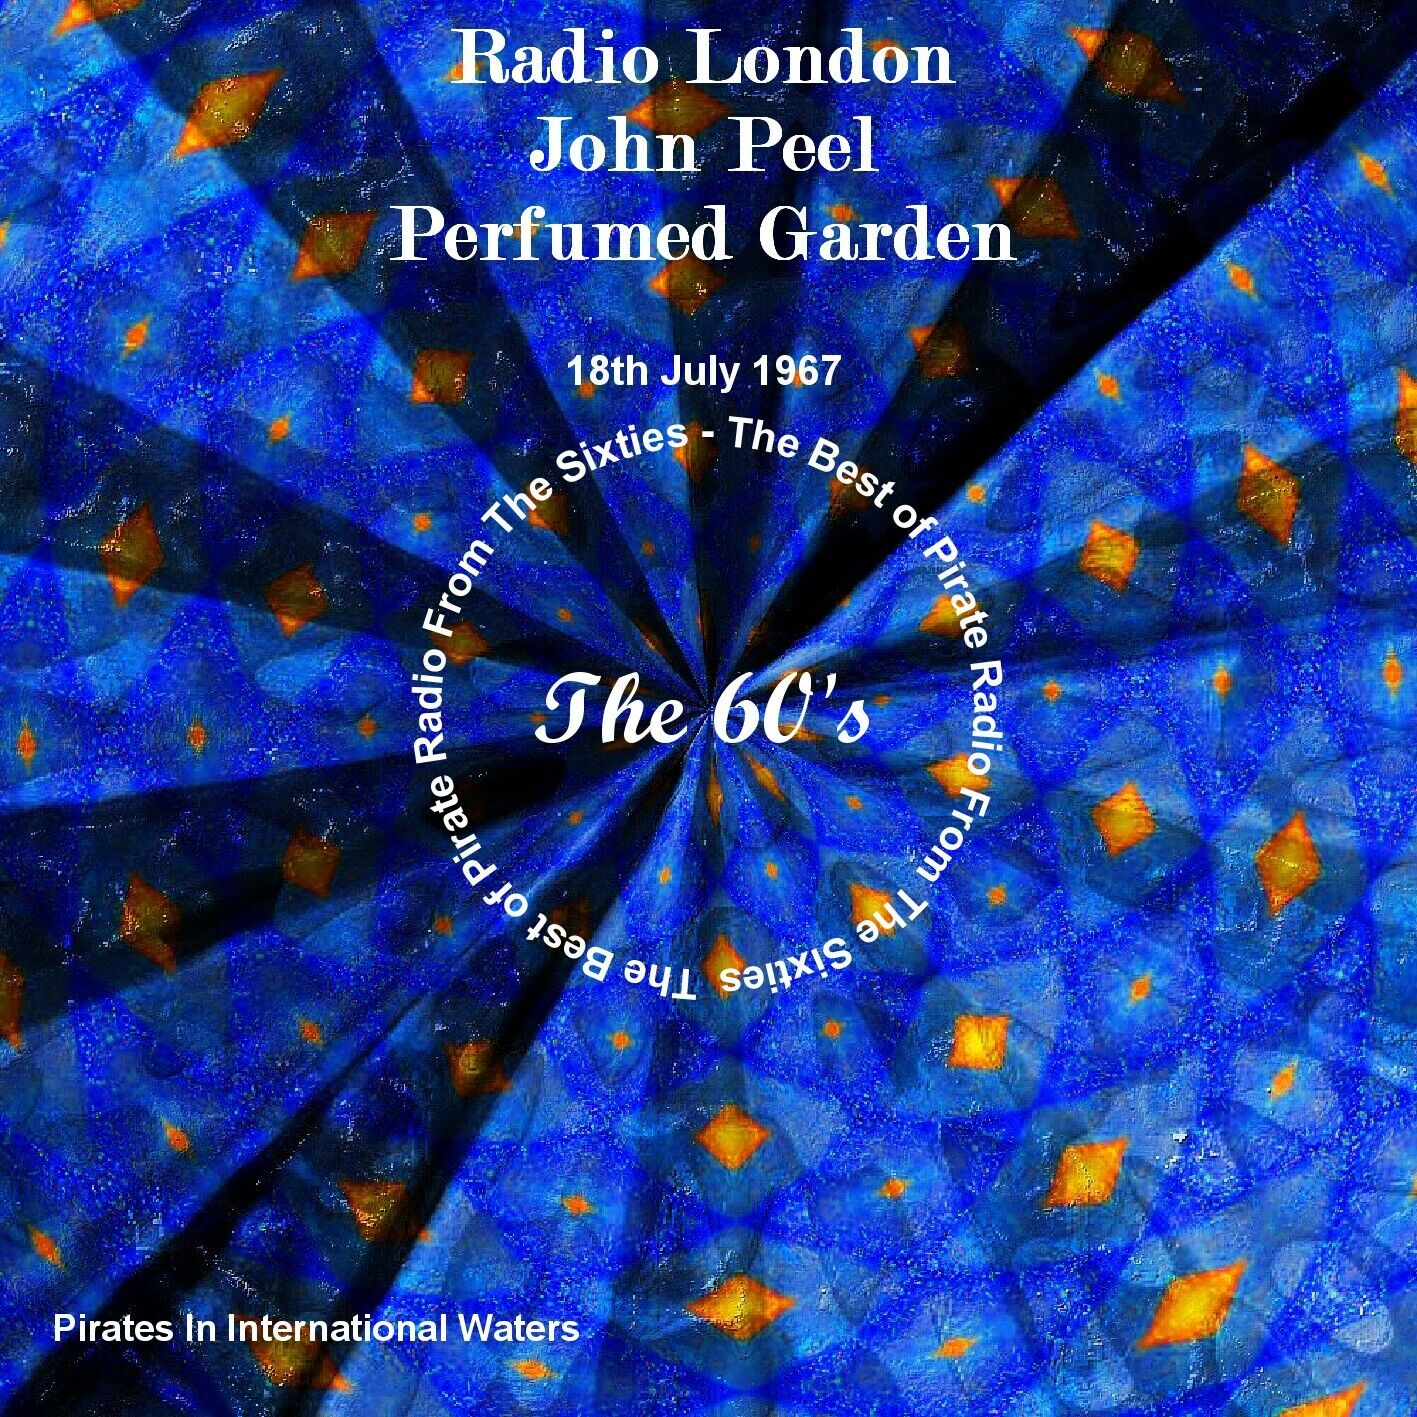 Pirate Radio London John Peel Perfumed Garden 18th July 1967   eBay